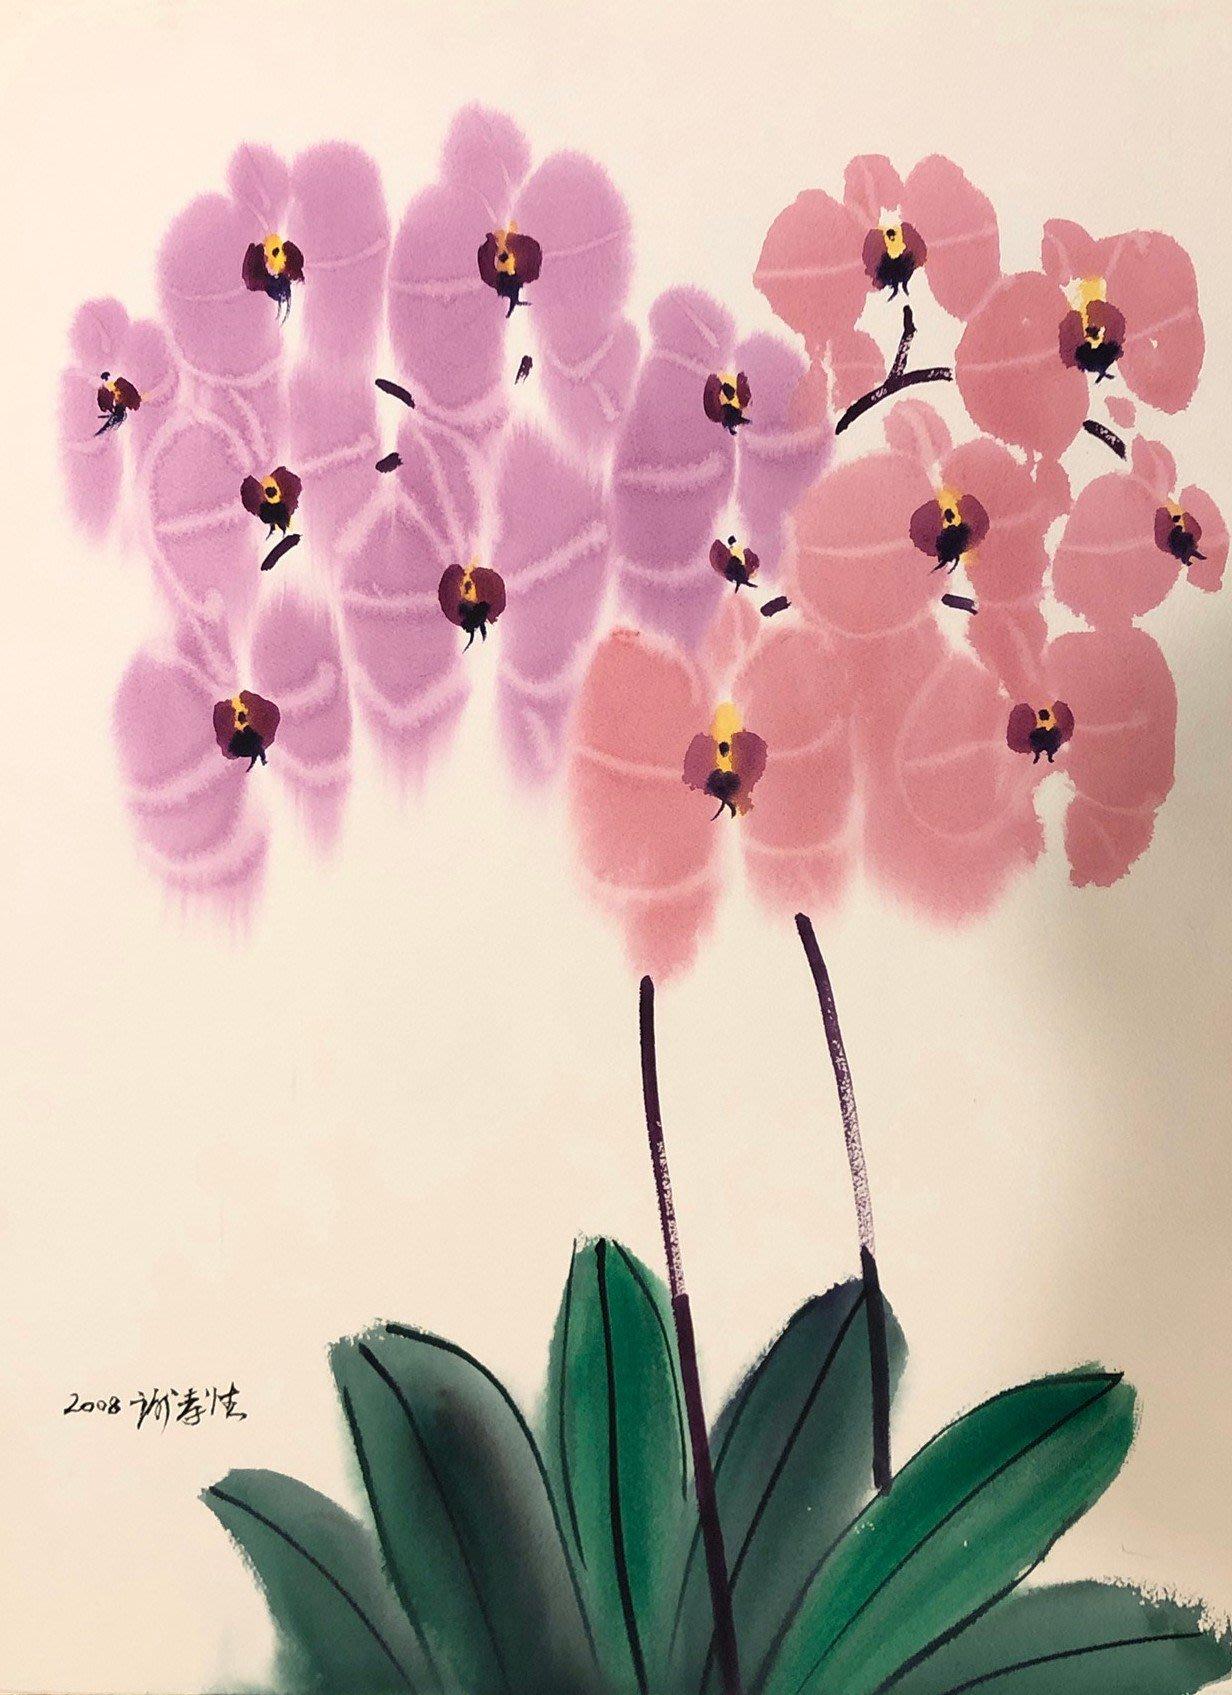 HH64 謝孝德 蘭花系列 77X57cm 2008 對開水彩 (桃園、客家、台灣、師大、美展、藝術、油畫)